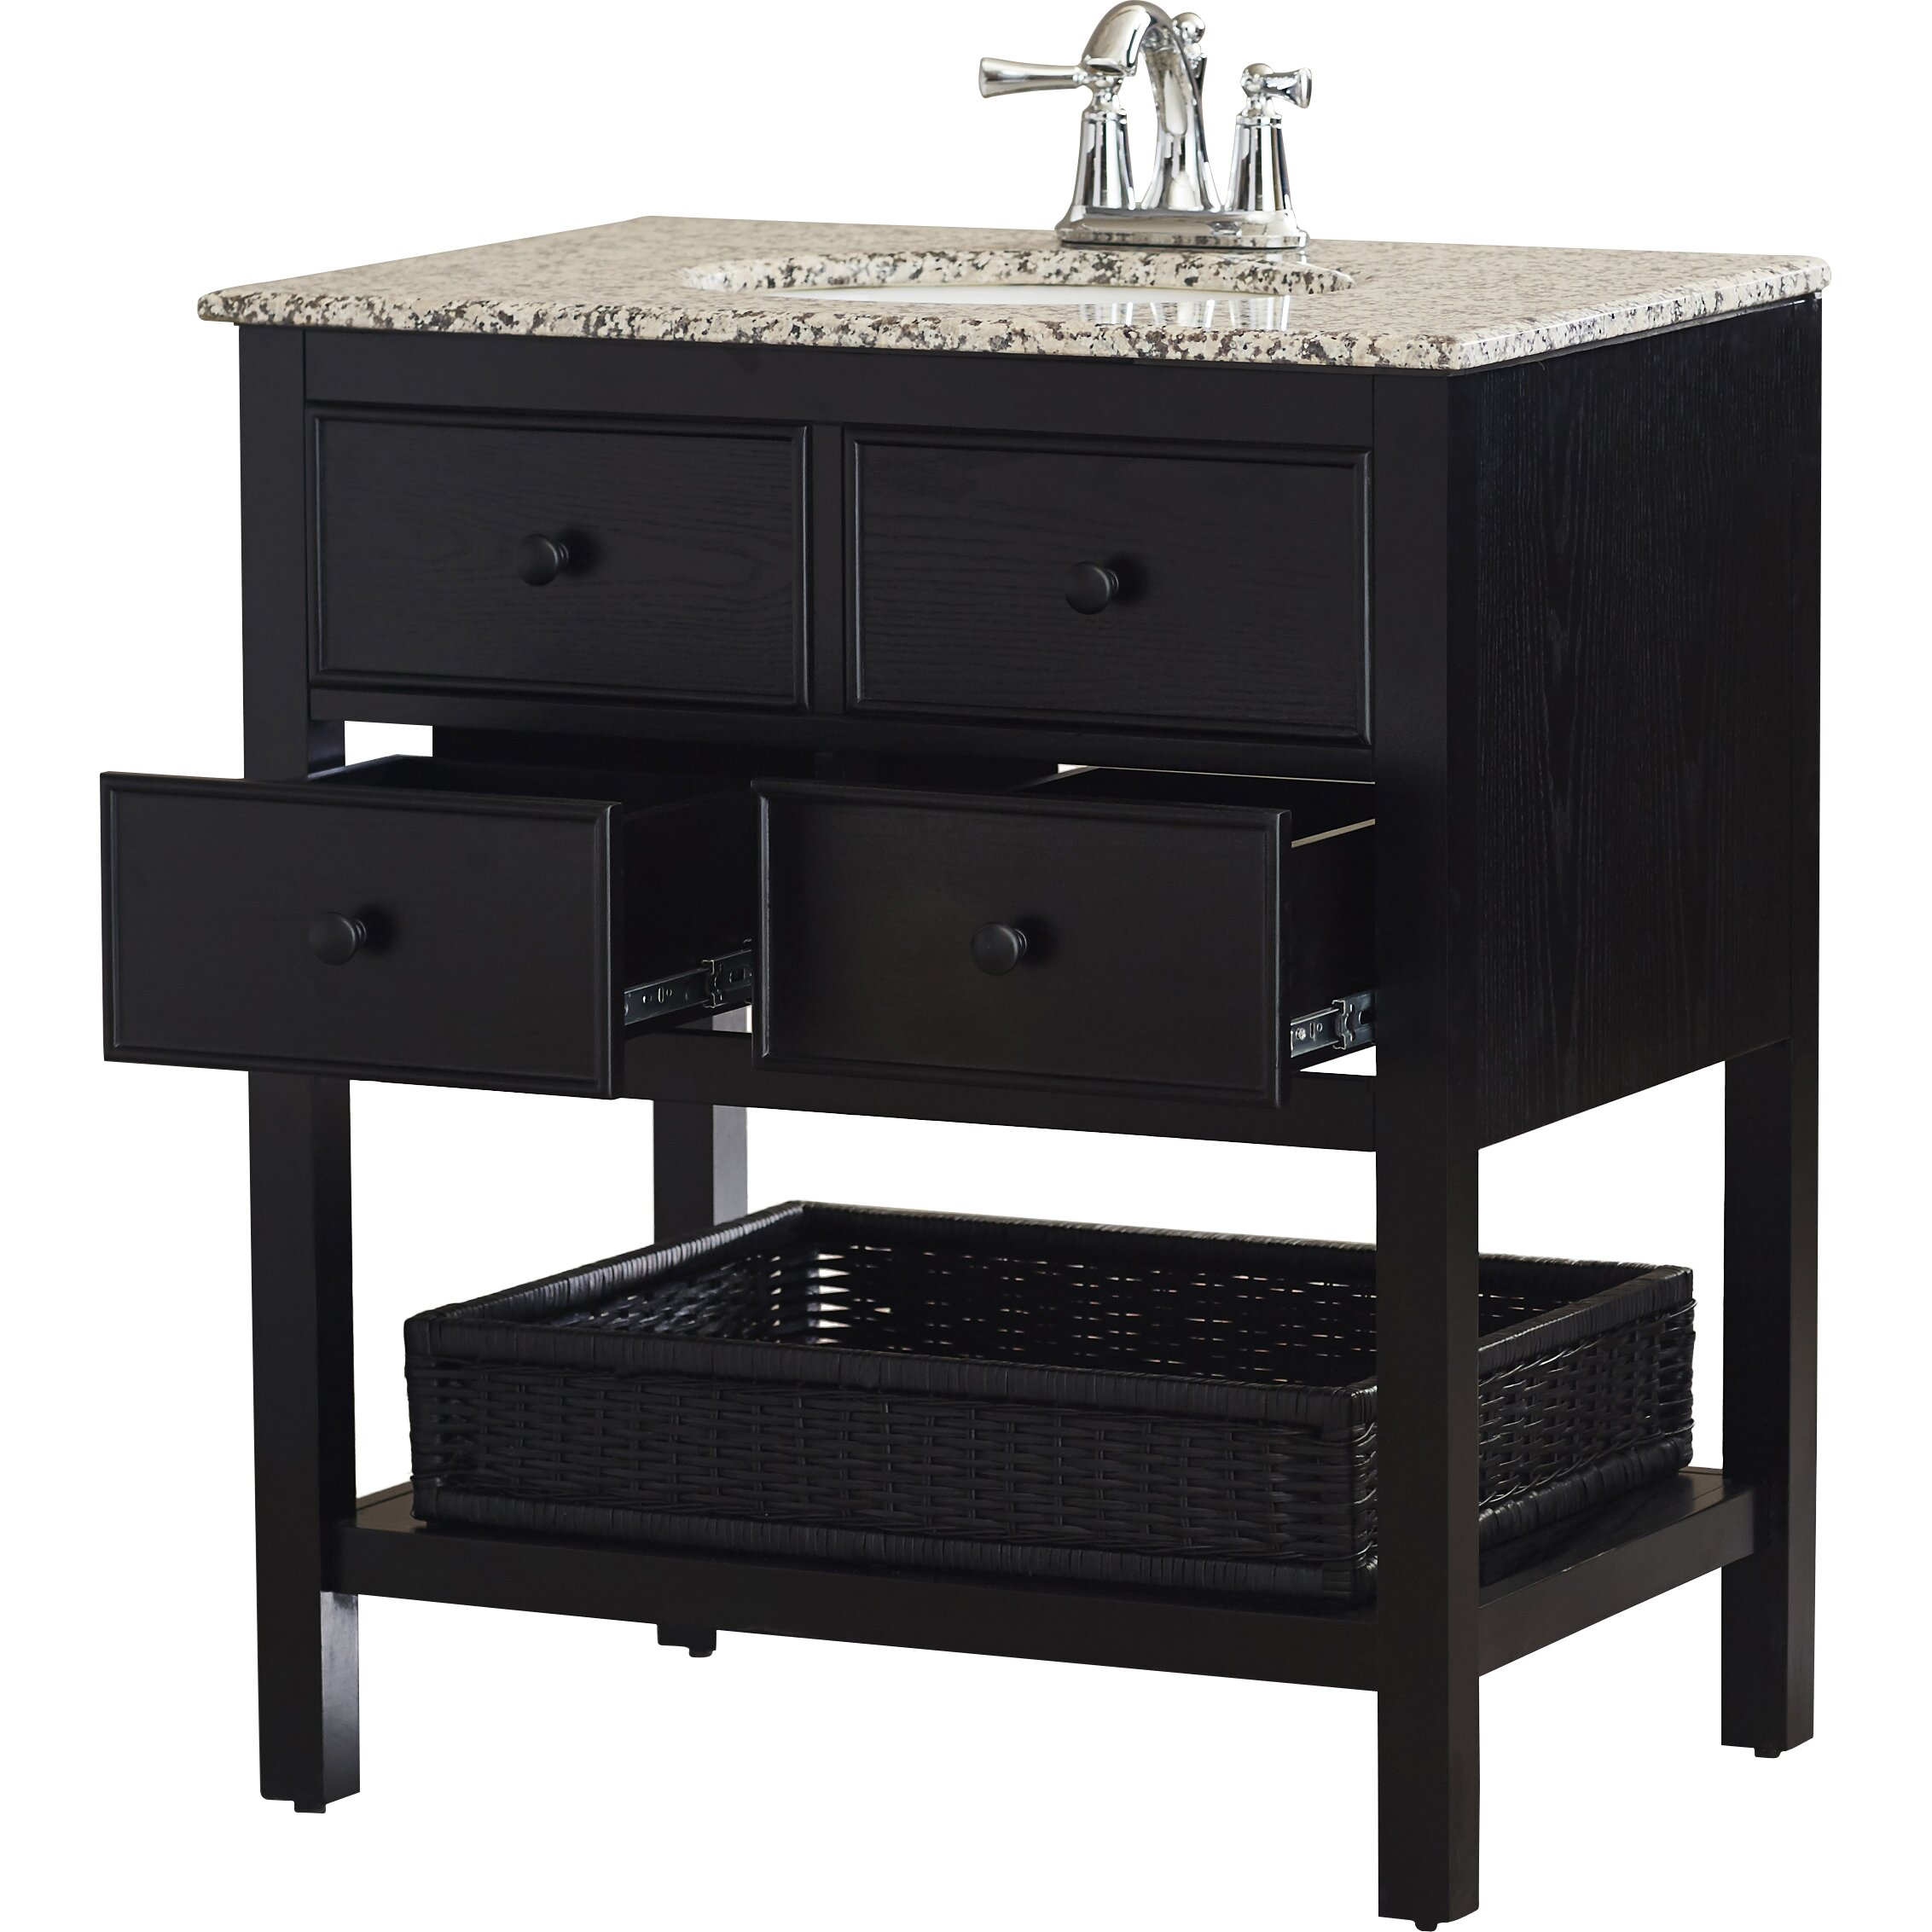 Alcott hill gettysburg 30 single bathroom vanity set for Bathroom vanity sets for sale